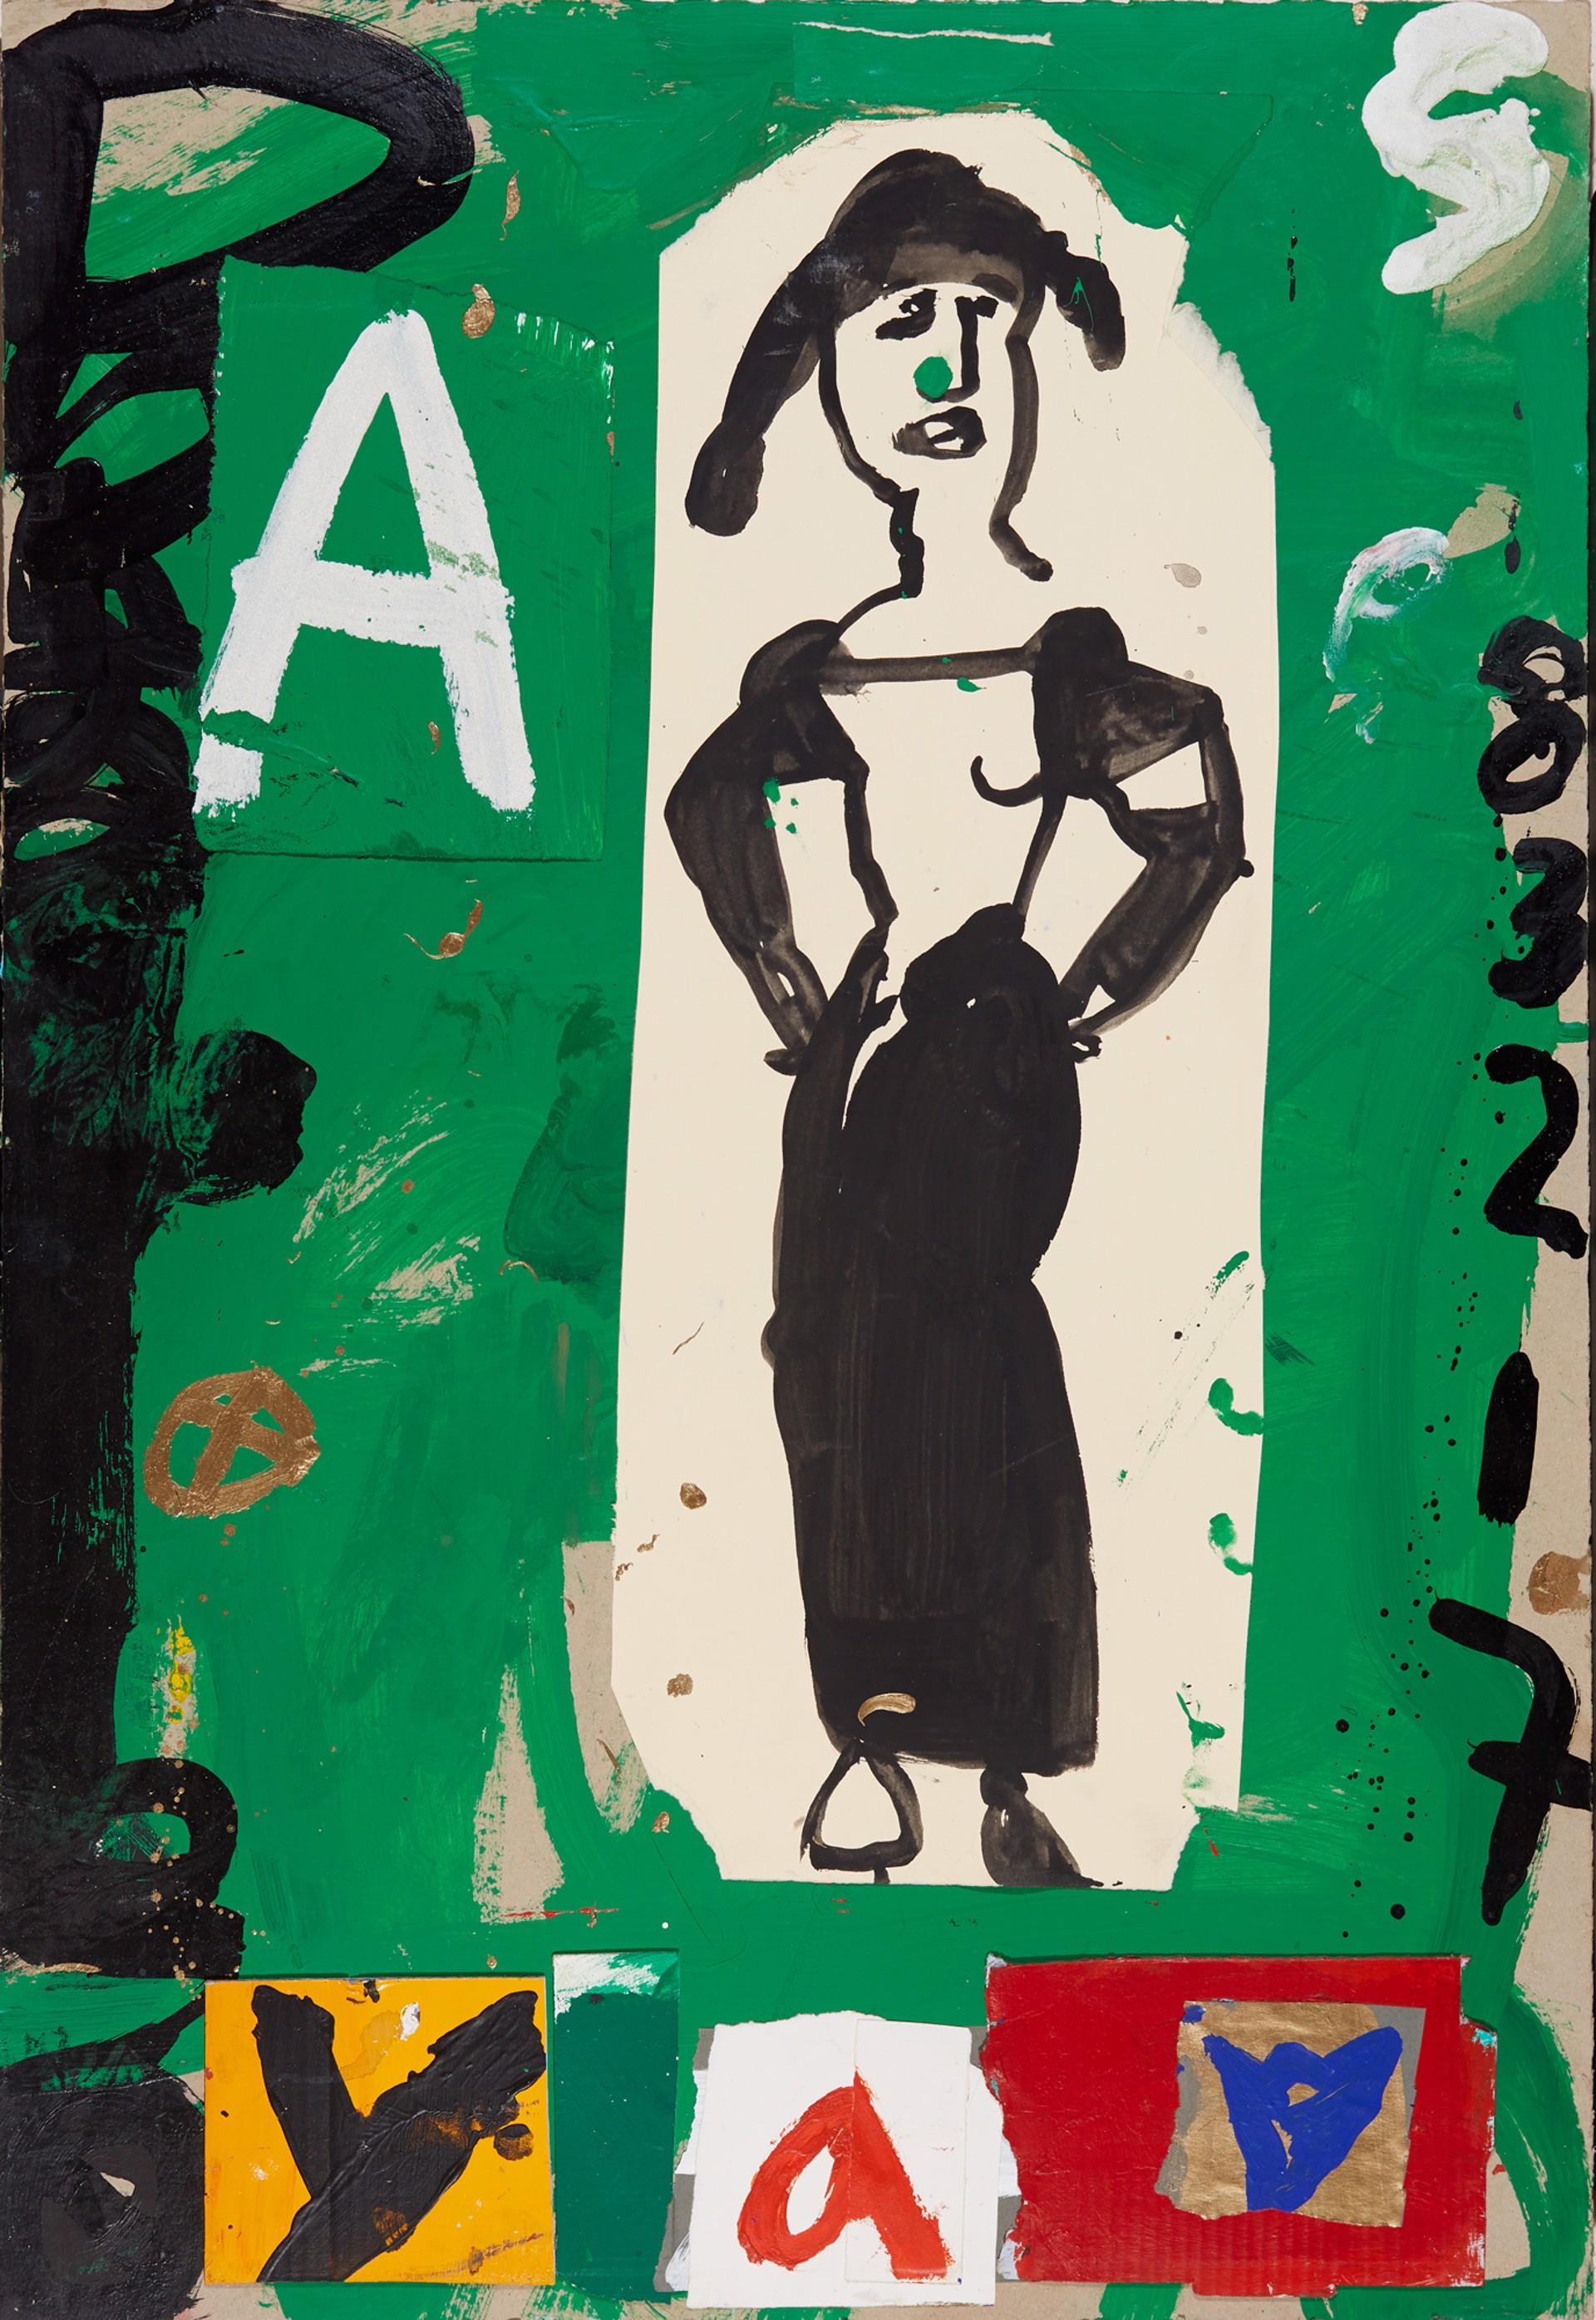 Annika of Sweden by James Havard